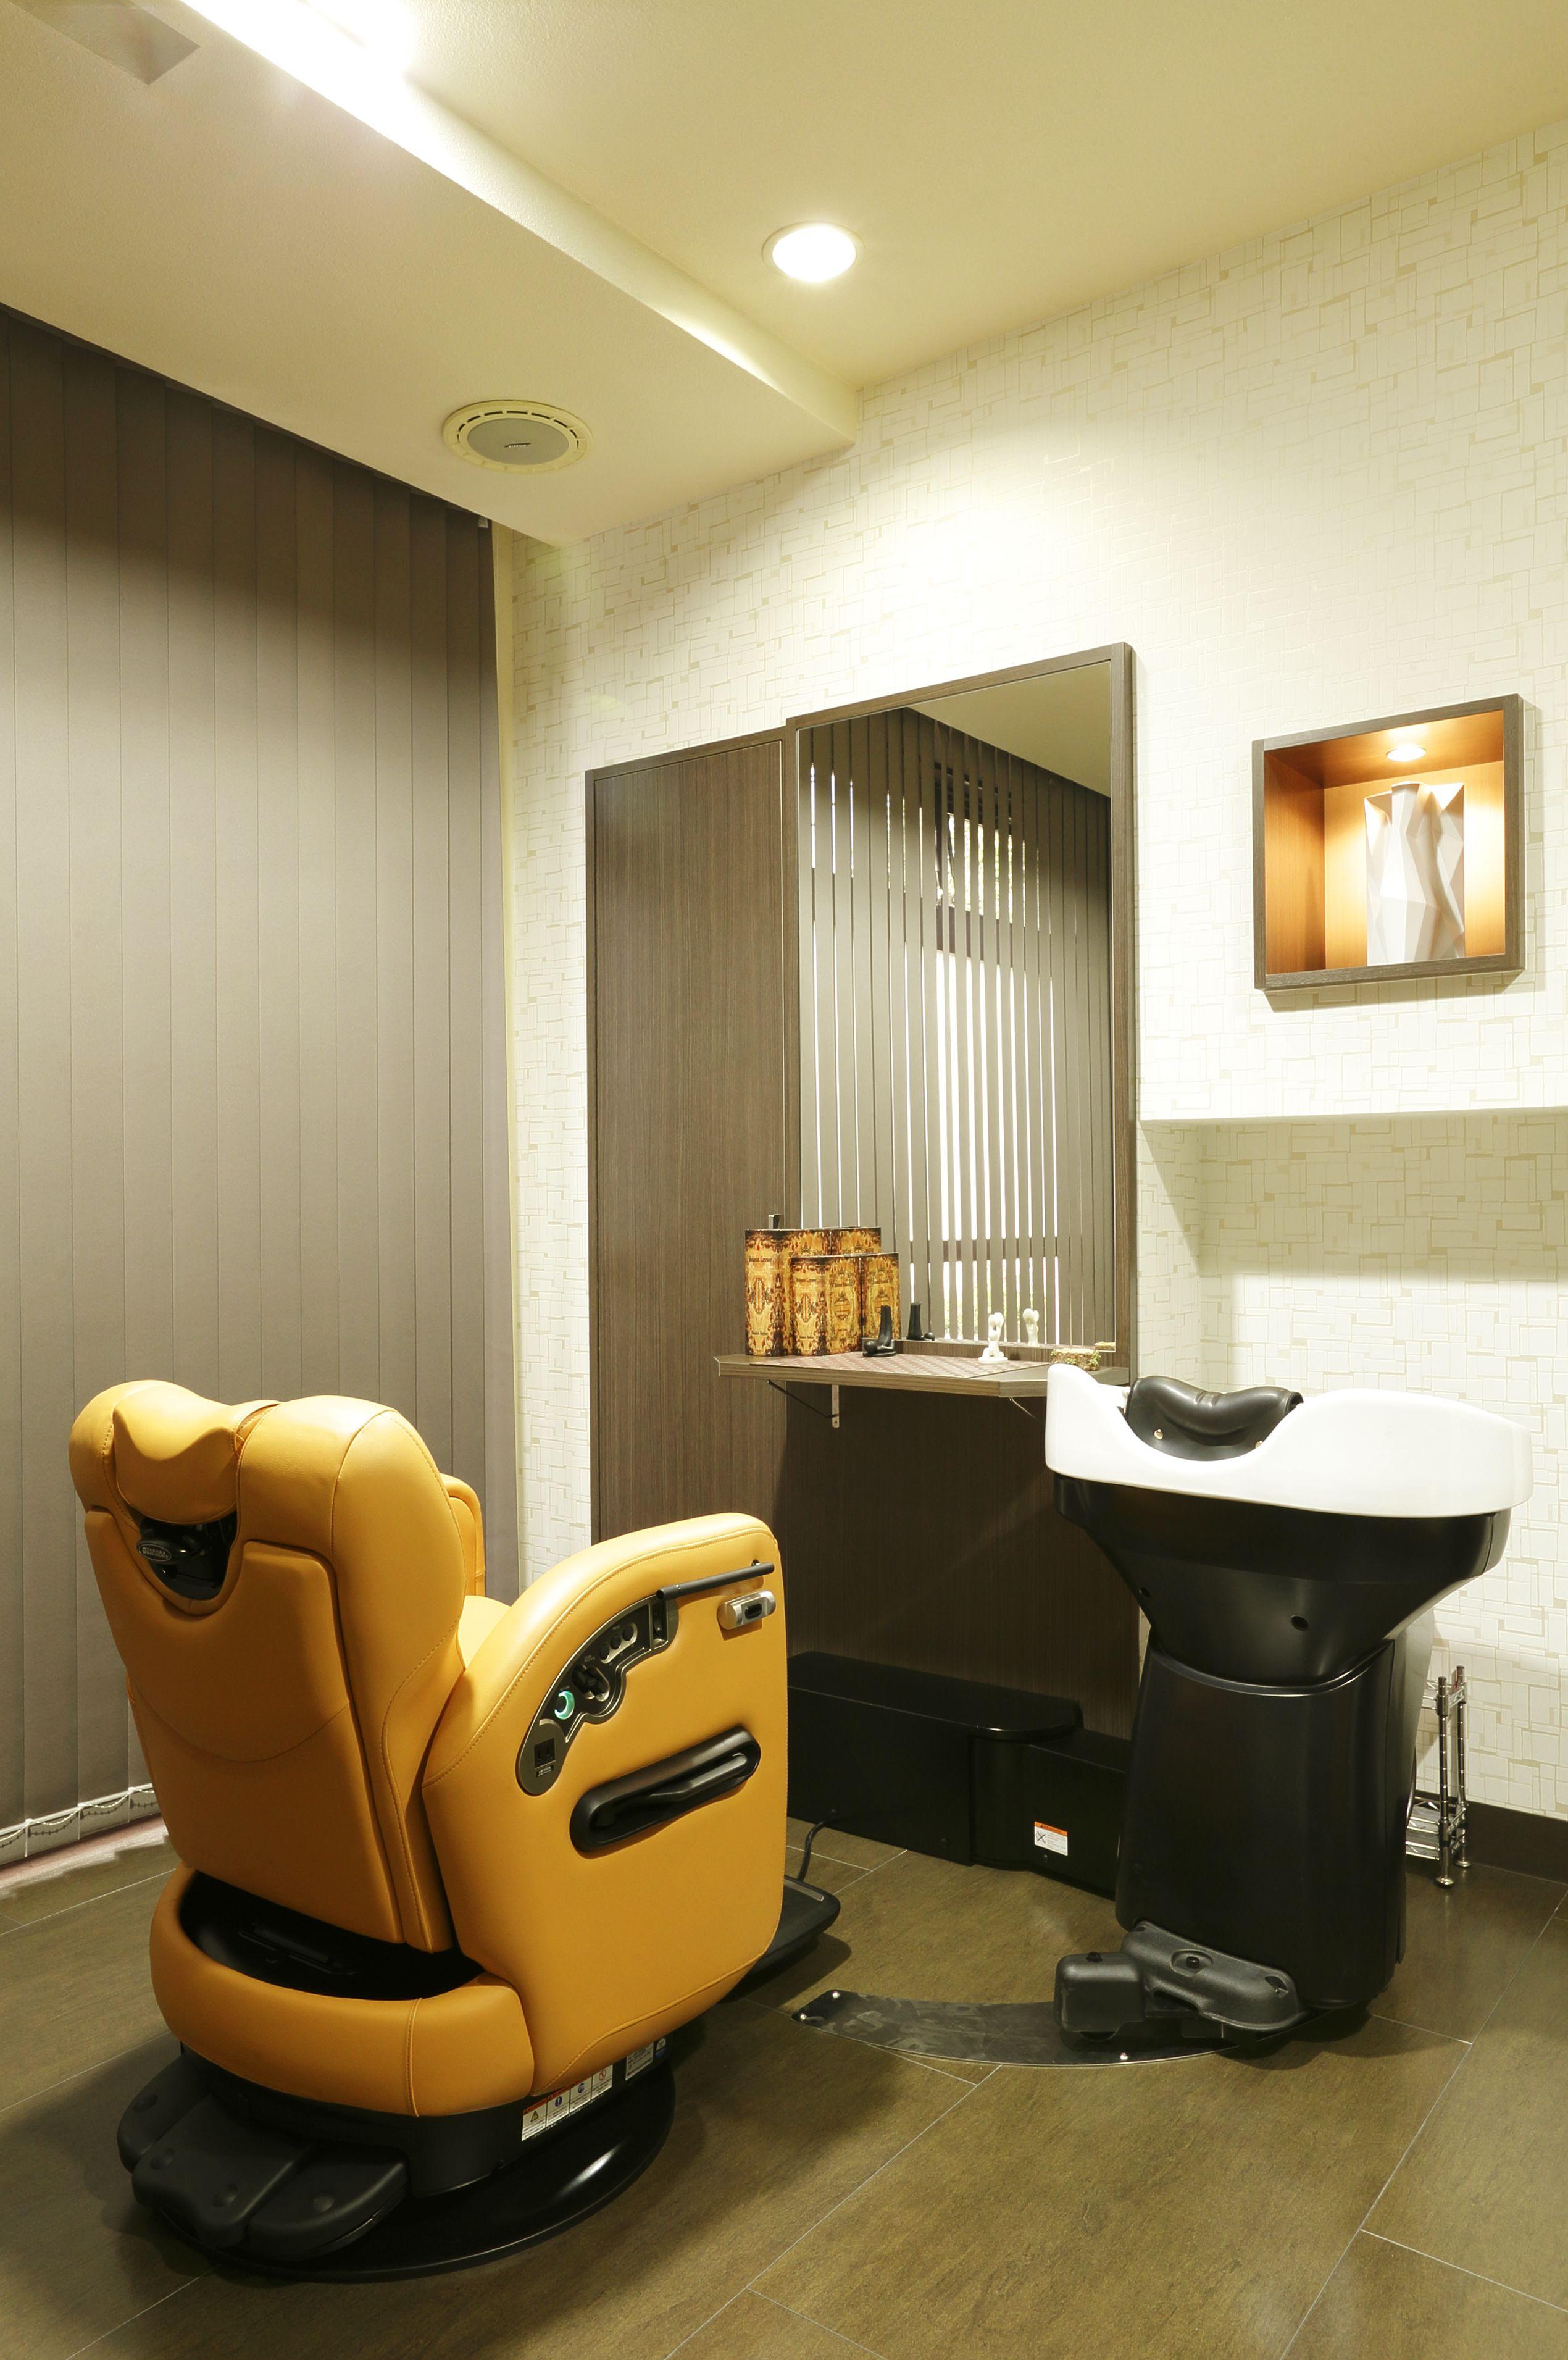 Beauty salon interior design ideas | + chairs + mirrors + space + ...